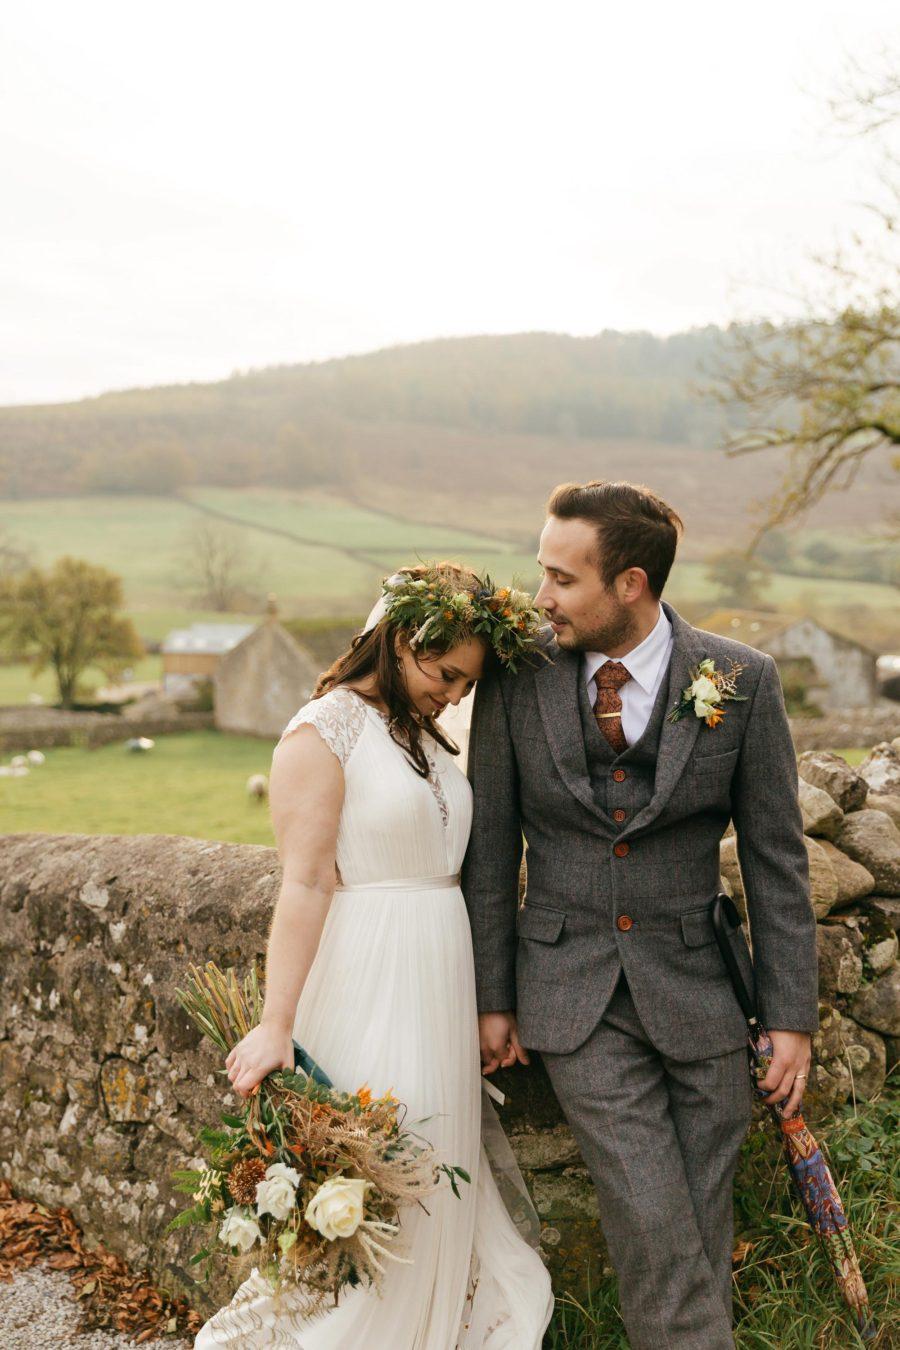 Hollie & Michael's Stylish Halloween Wedding at Cruck Barn